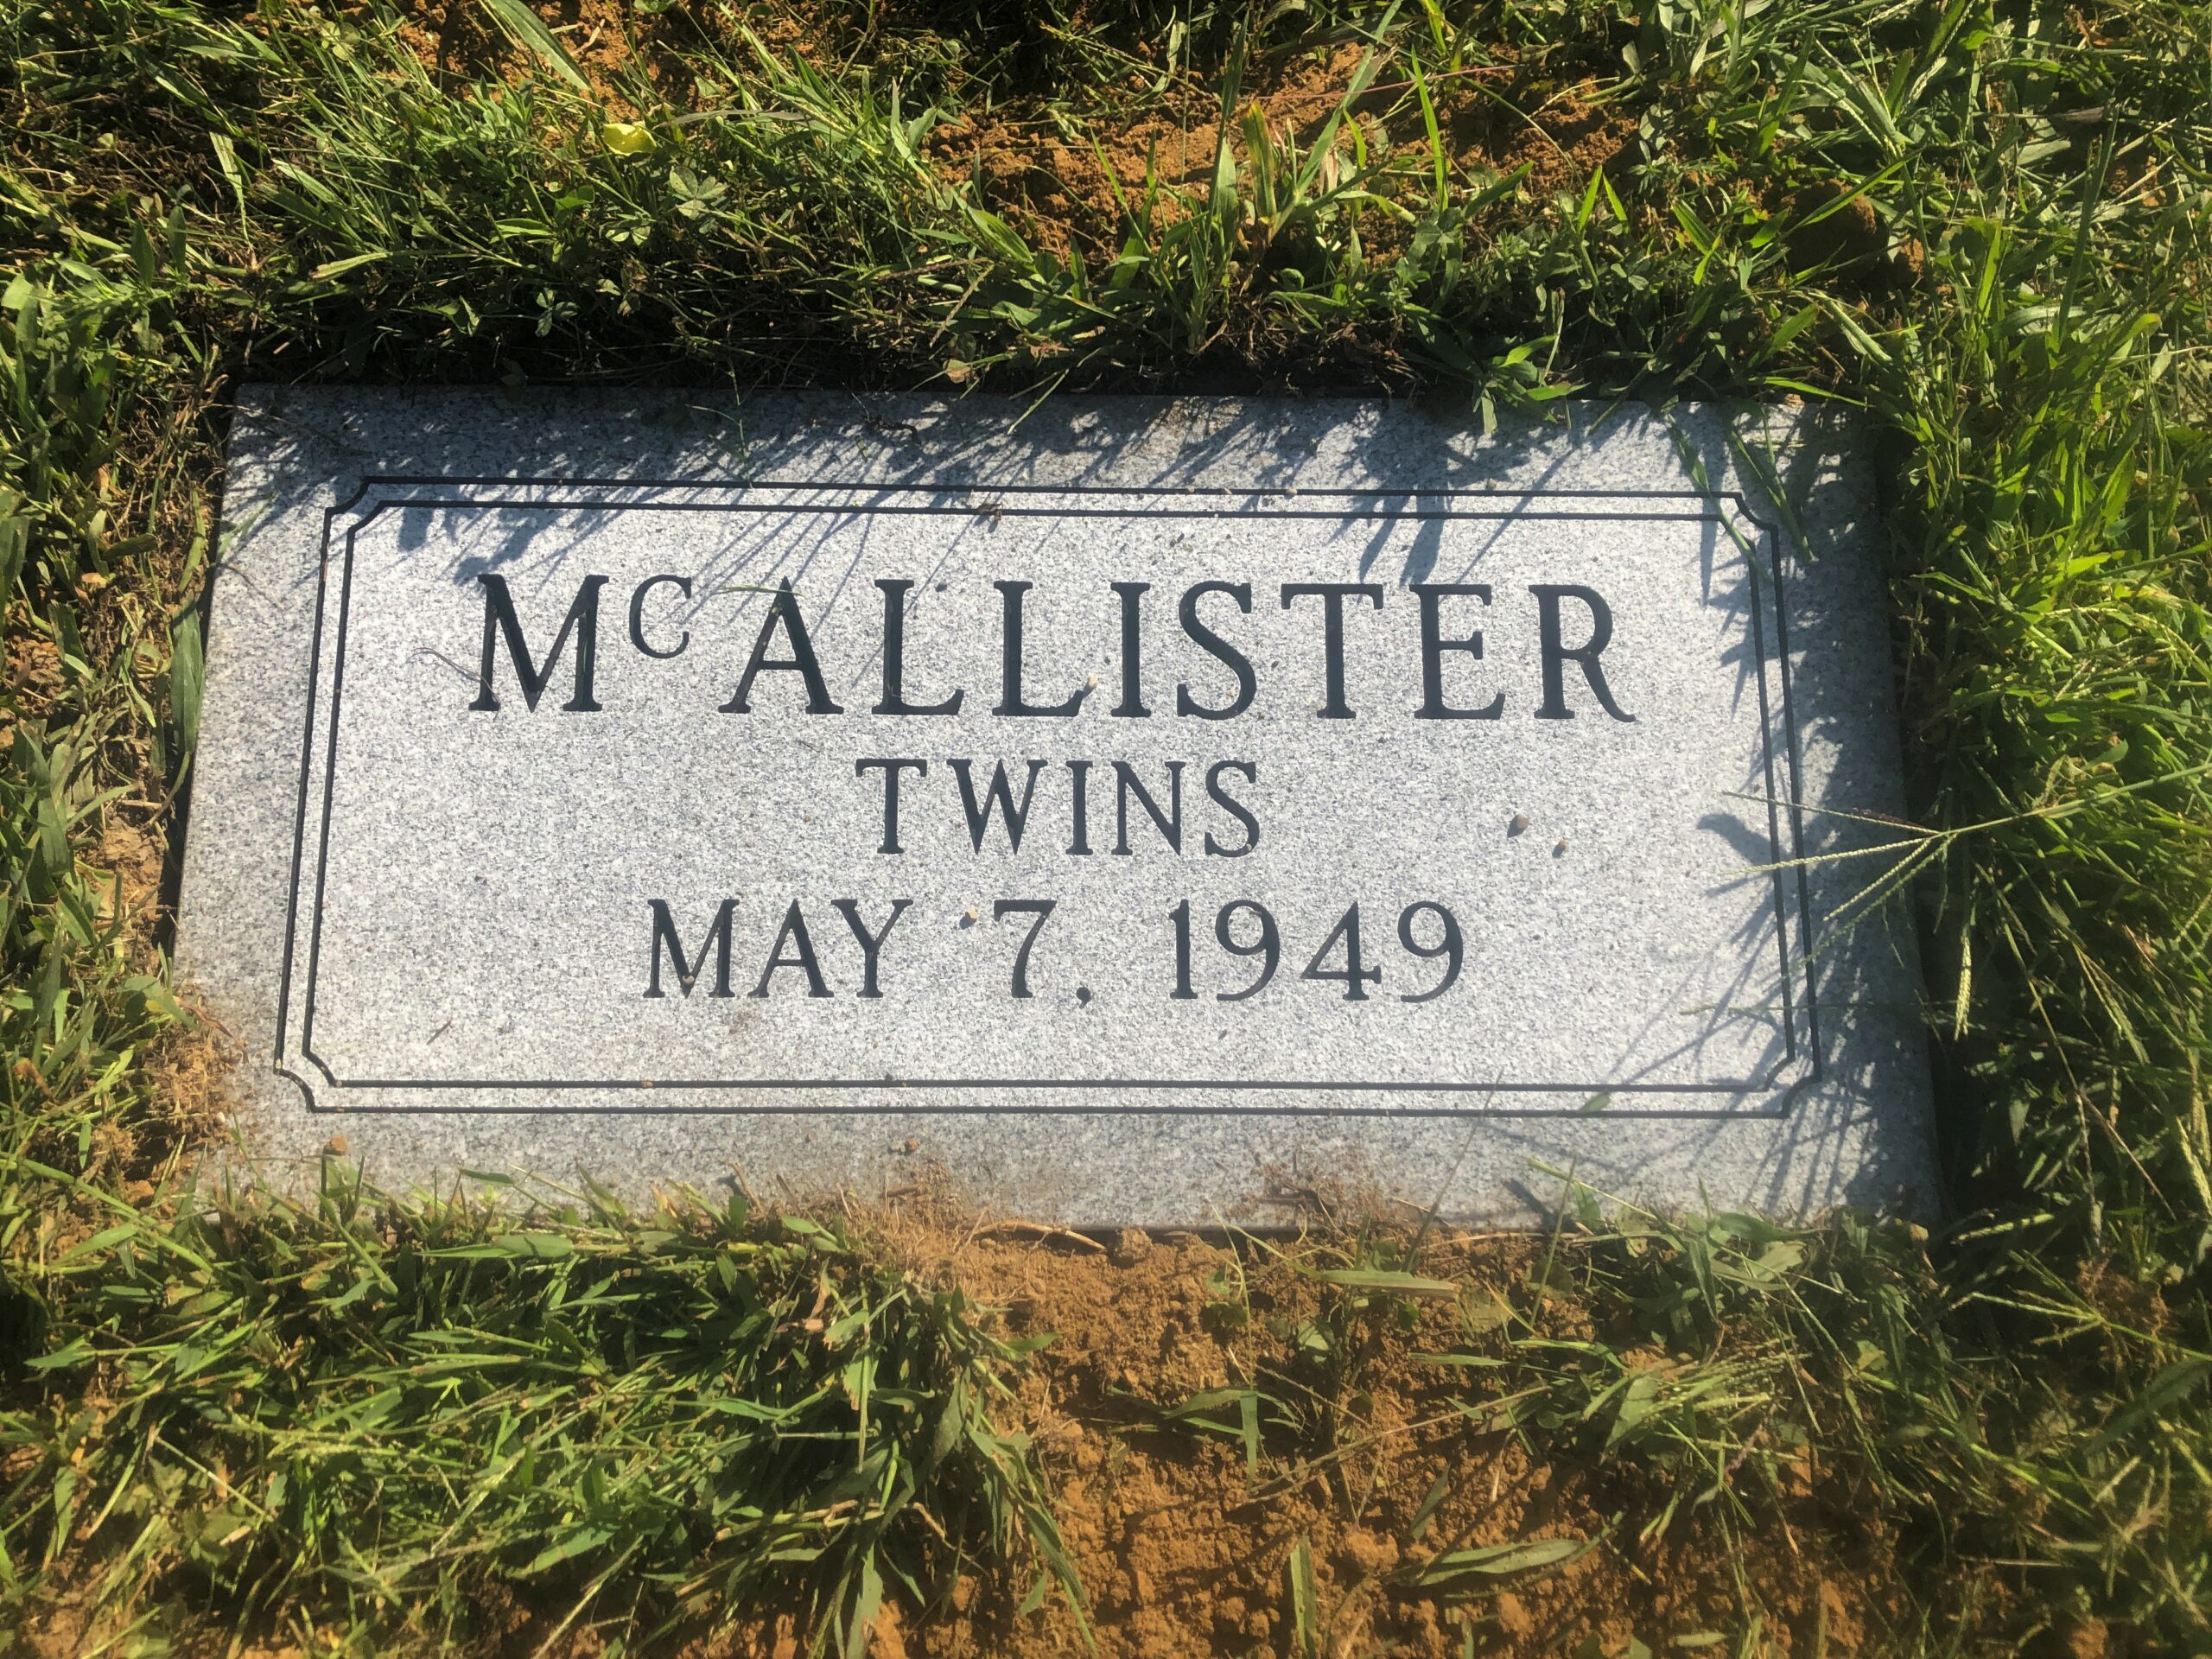 McAllister Twins - New Concord Cem., 2-0, Gray